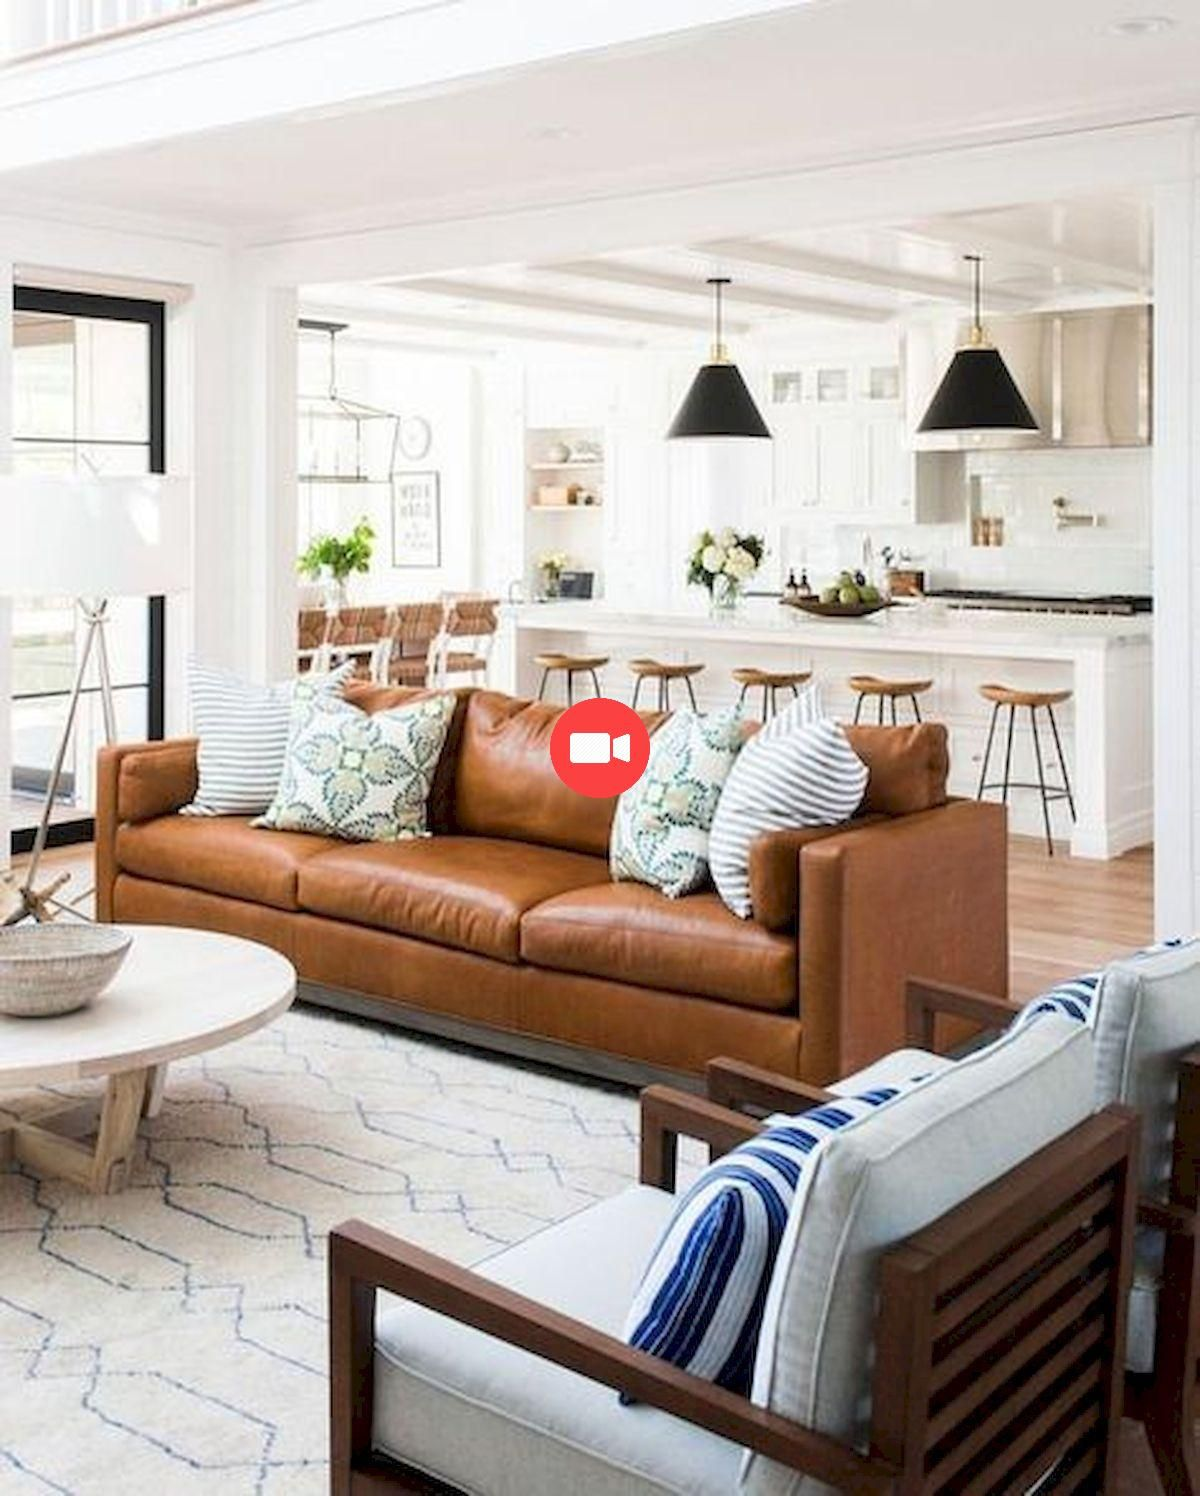 Risible Salon Meubles Ashley Homebasedbusiness Livingroomfurnitureluxury Salonferme Ideesdesal Living Room Leather Brown Living Room Farm House Living Room